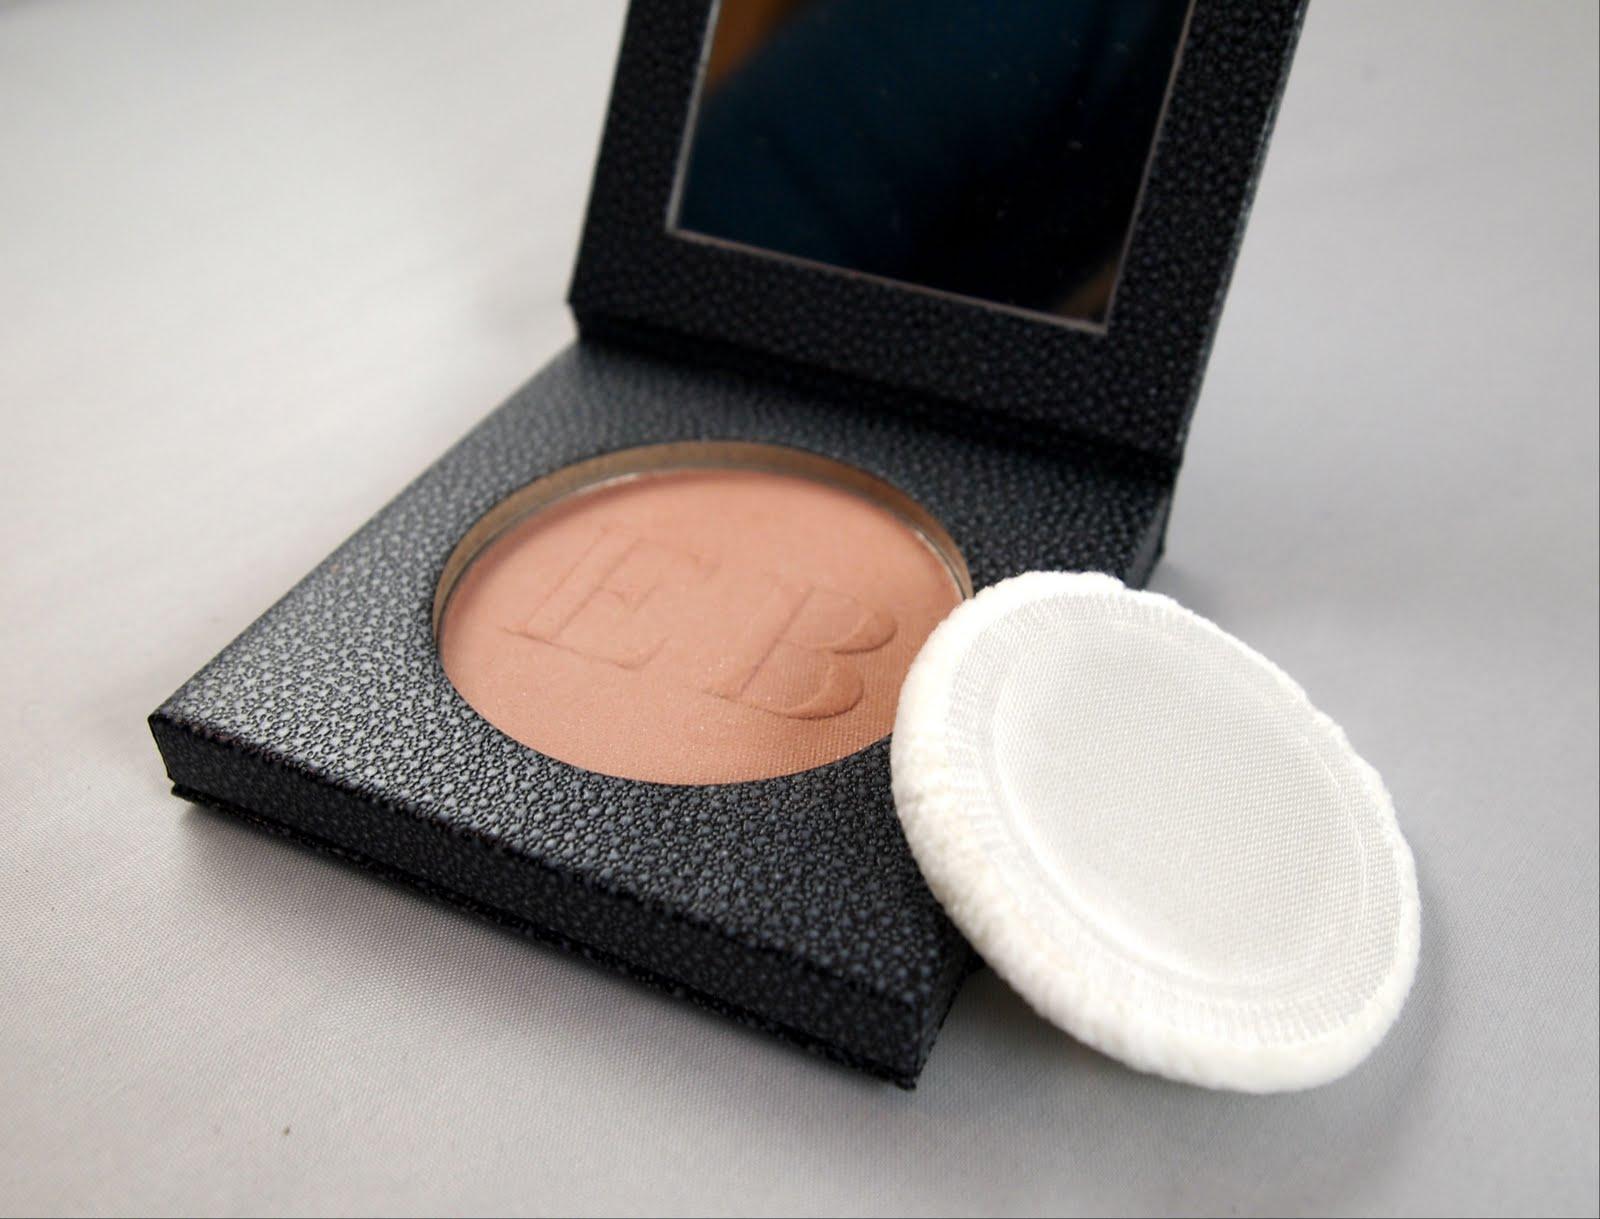 04163919ad6c47 Kaylin s Kit  Review  Ecco Bella Flower Color Bronzing Powder